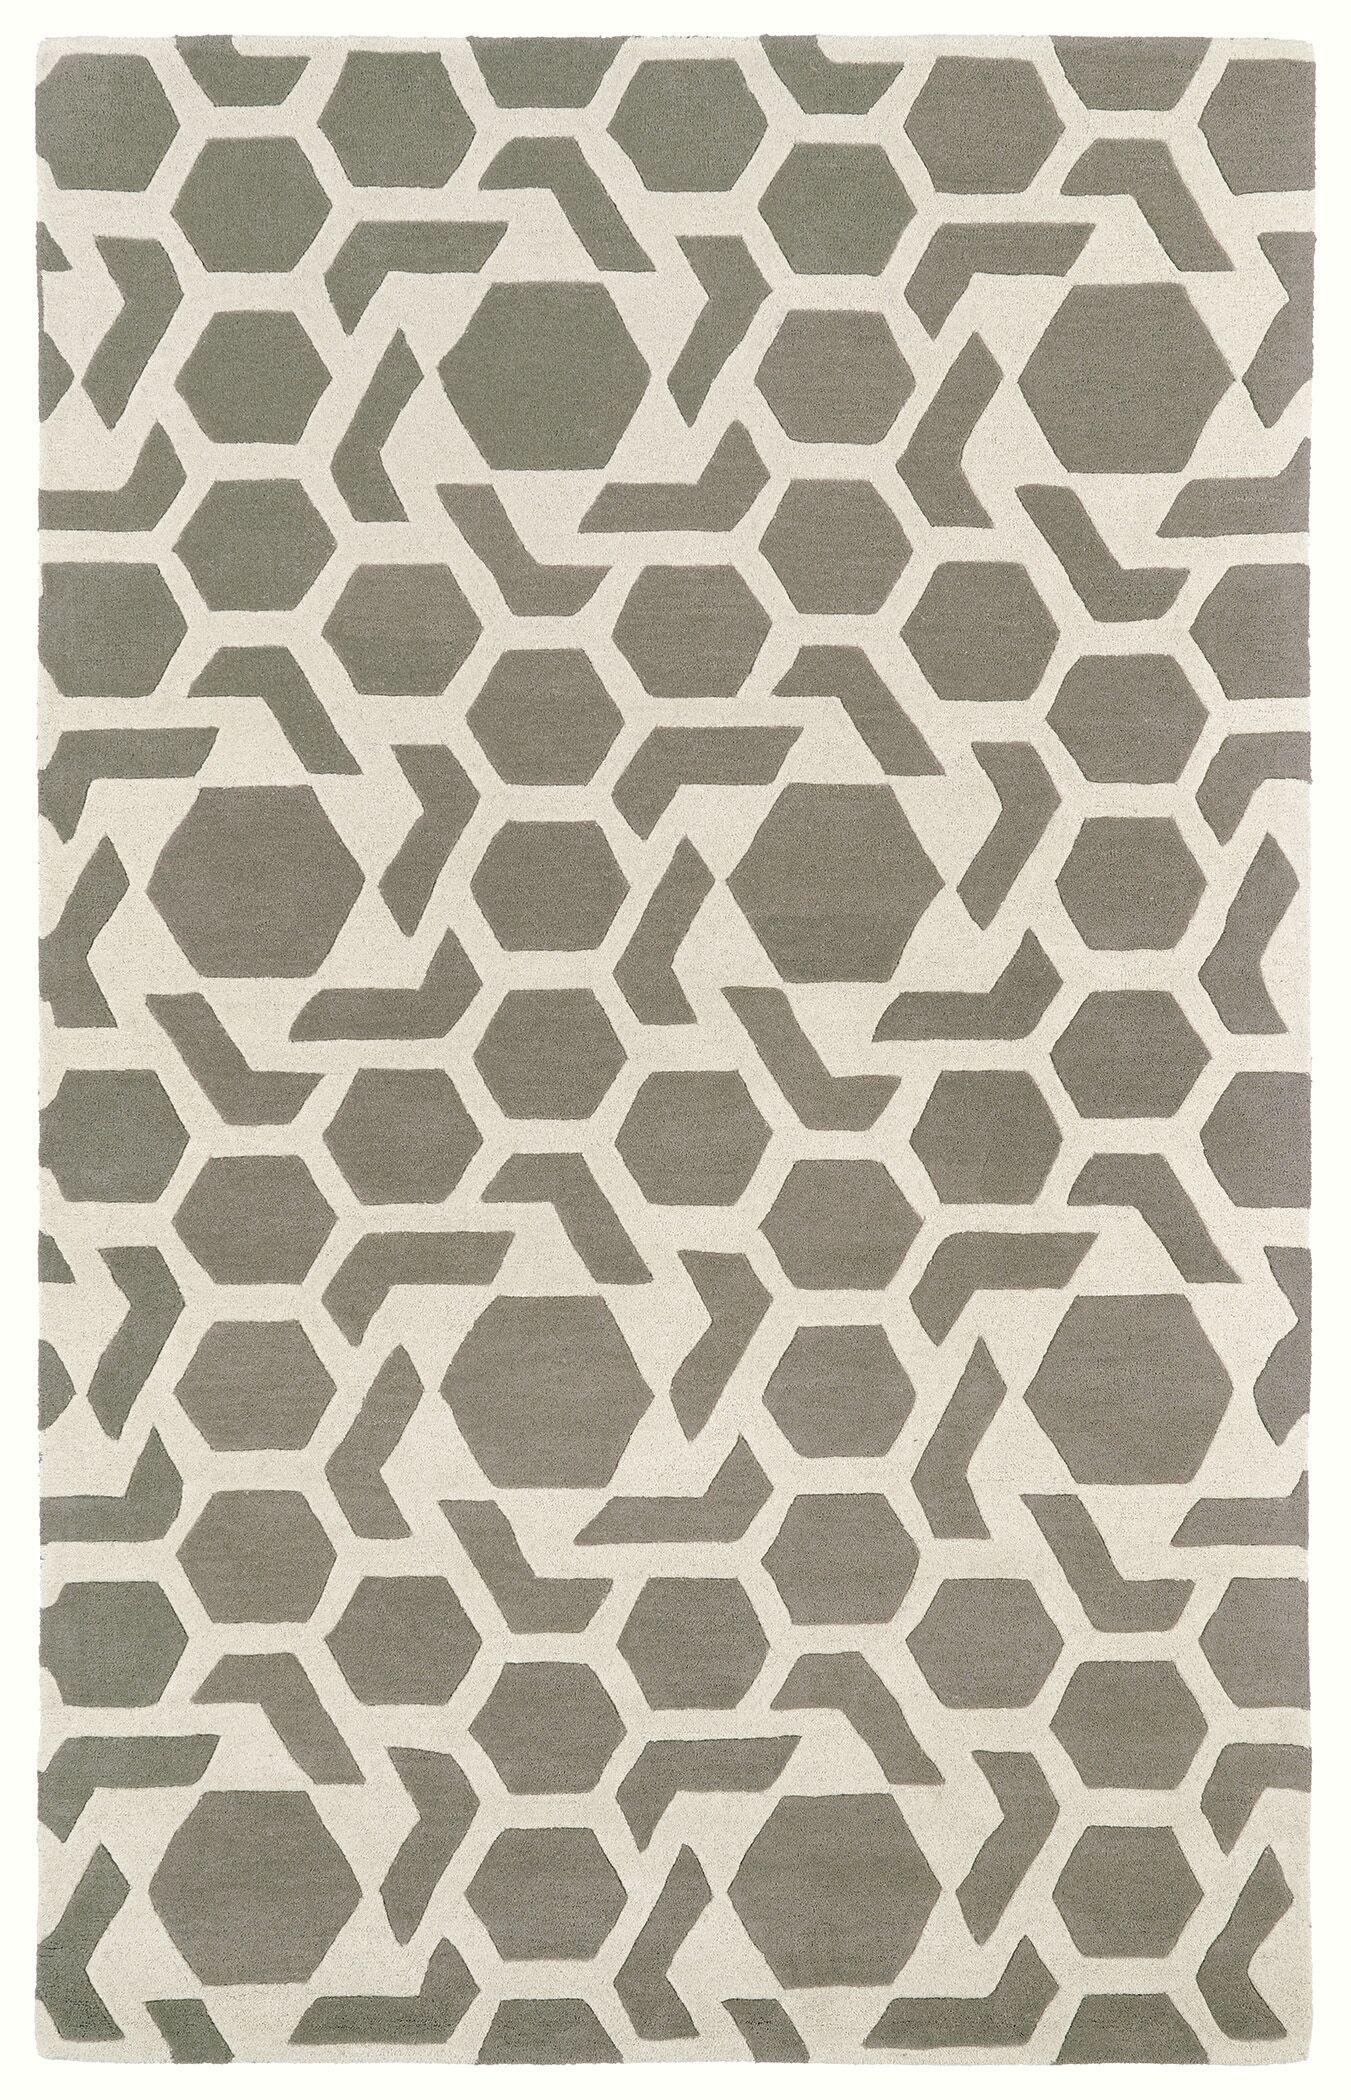 Fairlee Grey/White Area Rug Rug Size: Rectangle 9'6